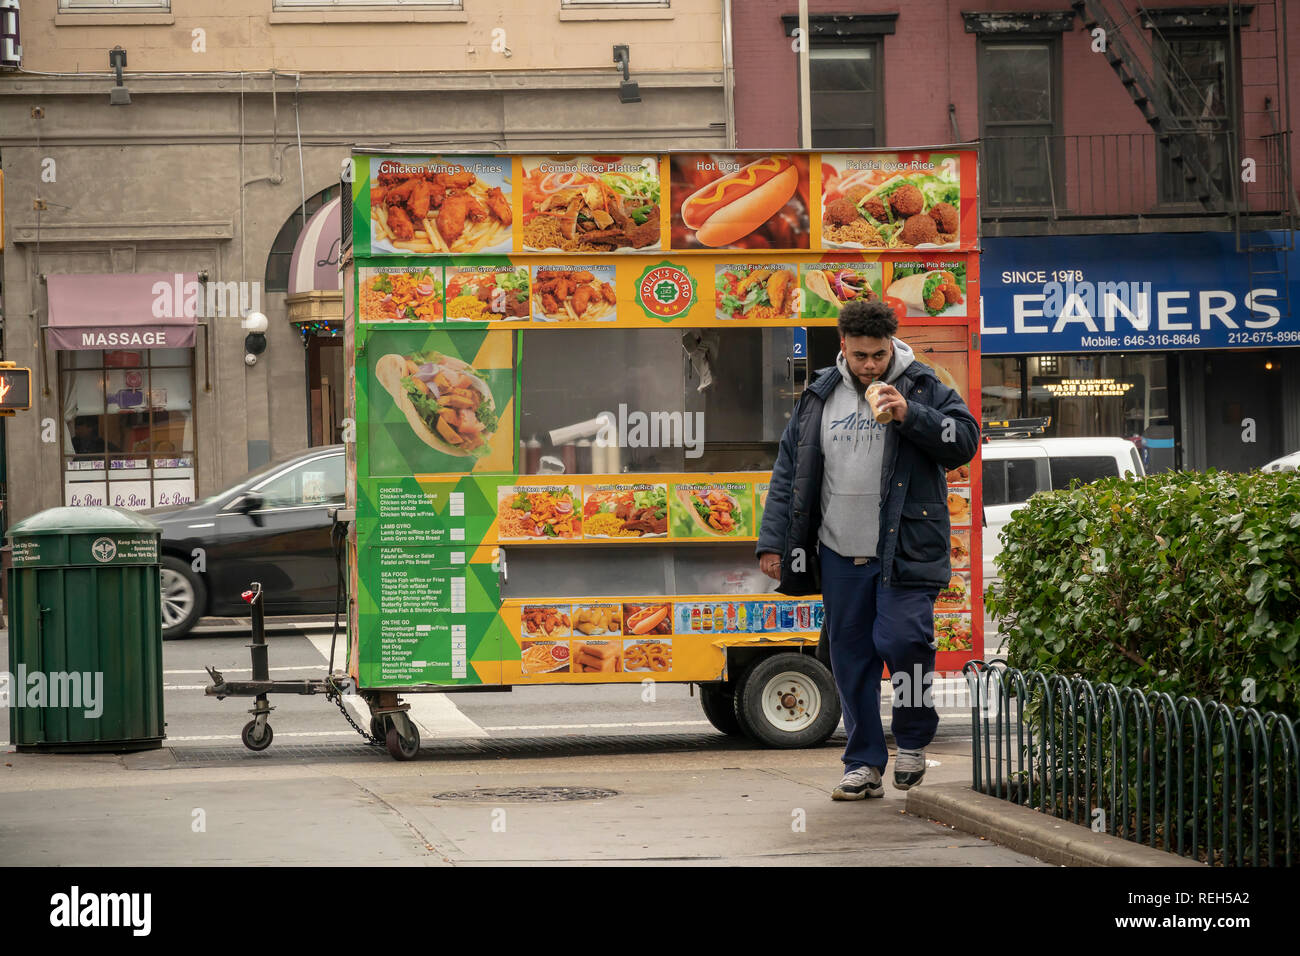 Halal Fast Food Restaurant Sign Stock Photos & Halal Fast